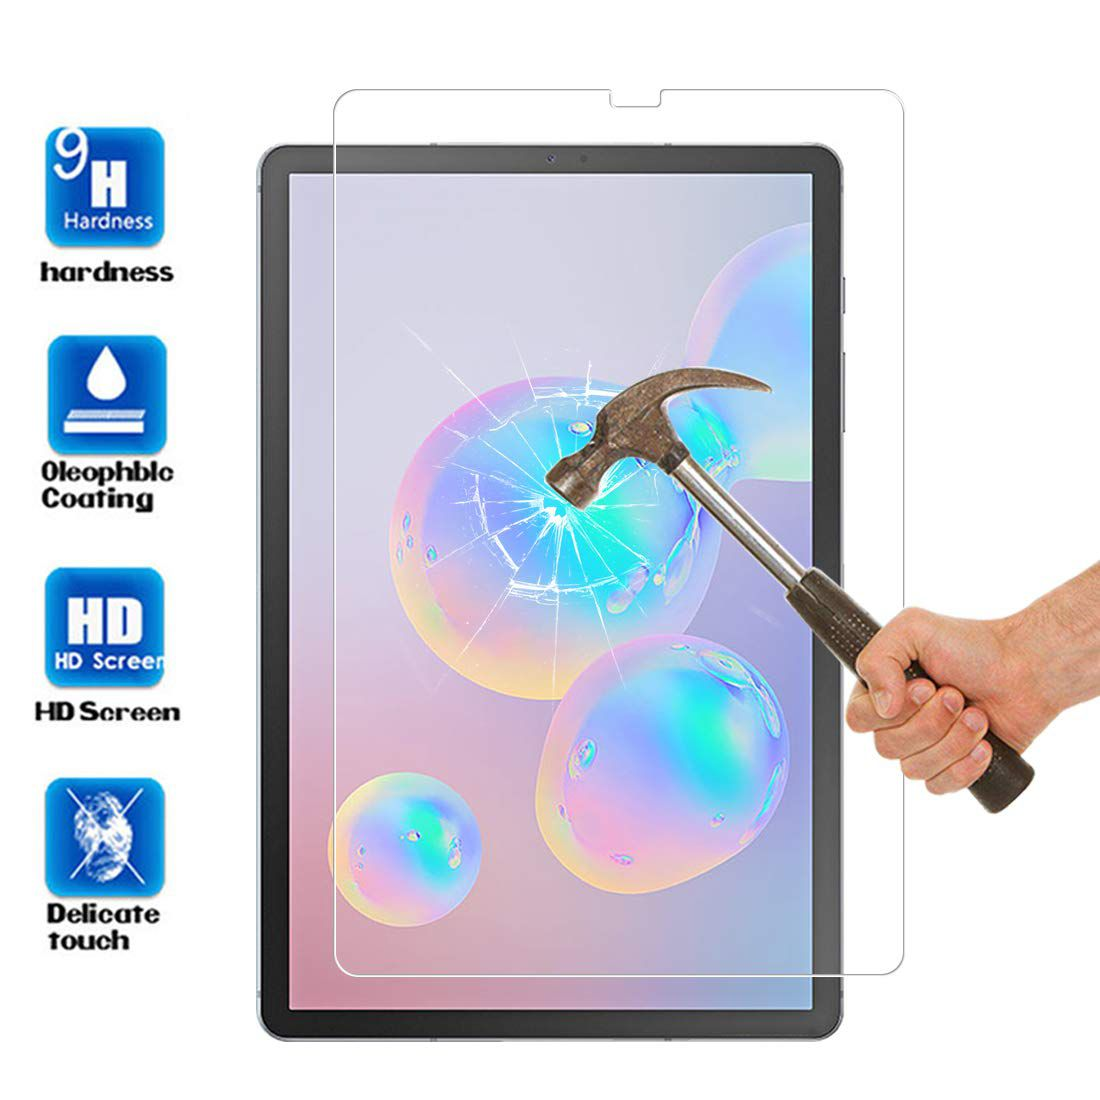 Kit Capa Tablet Samsung Galaxy Tab S6 10.5 T860 T865 Giratória + Película de Vidro